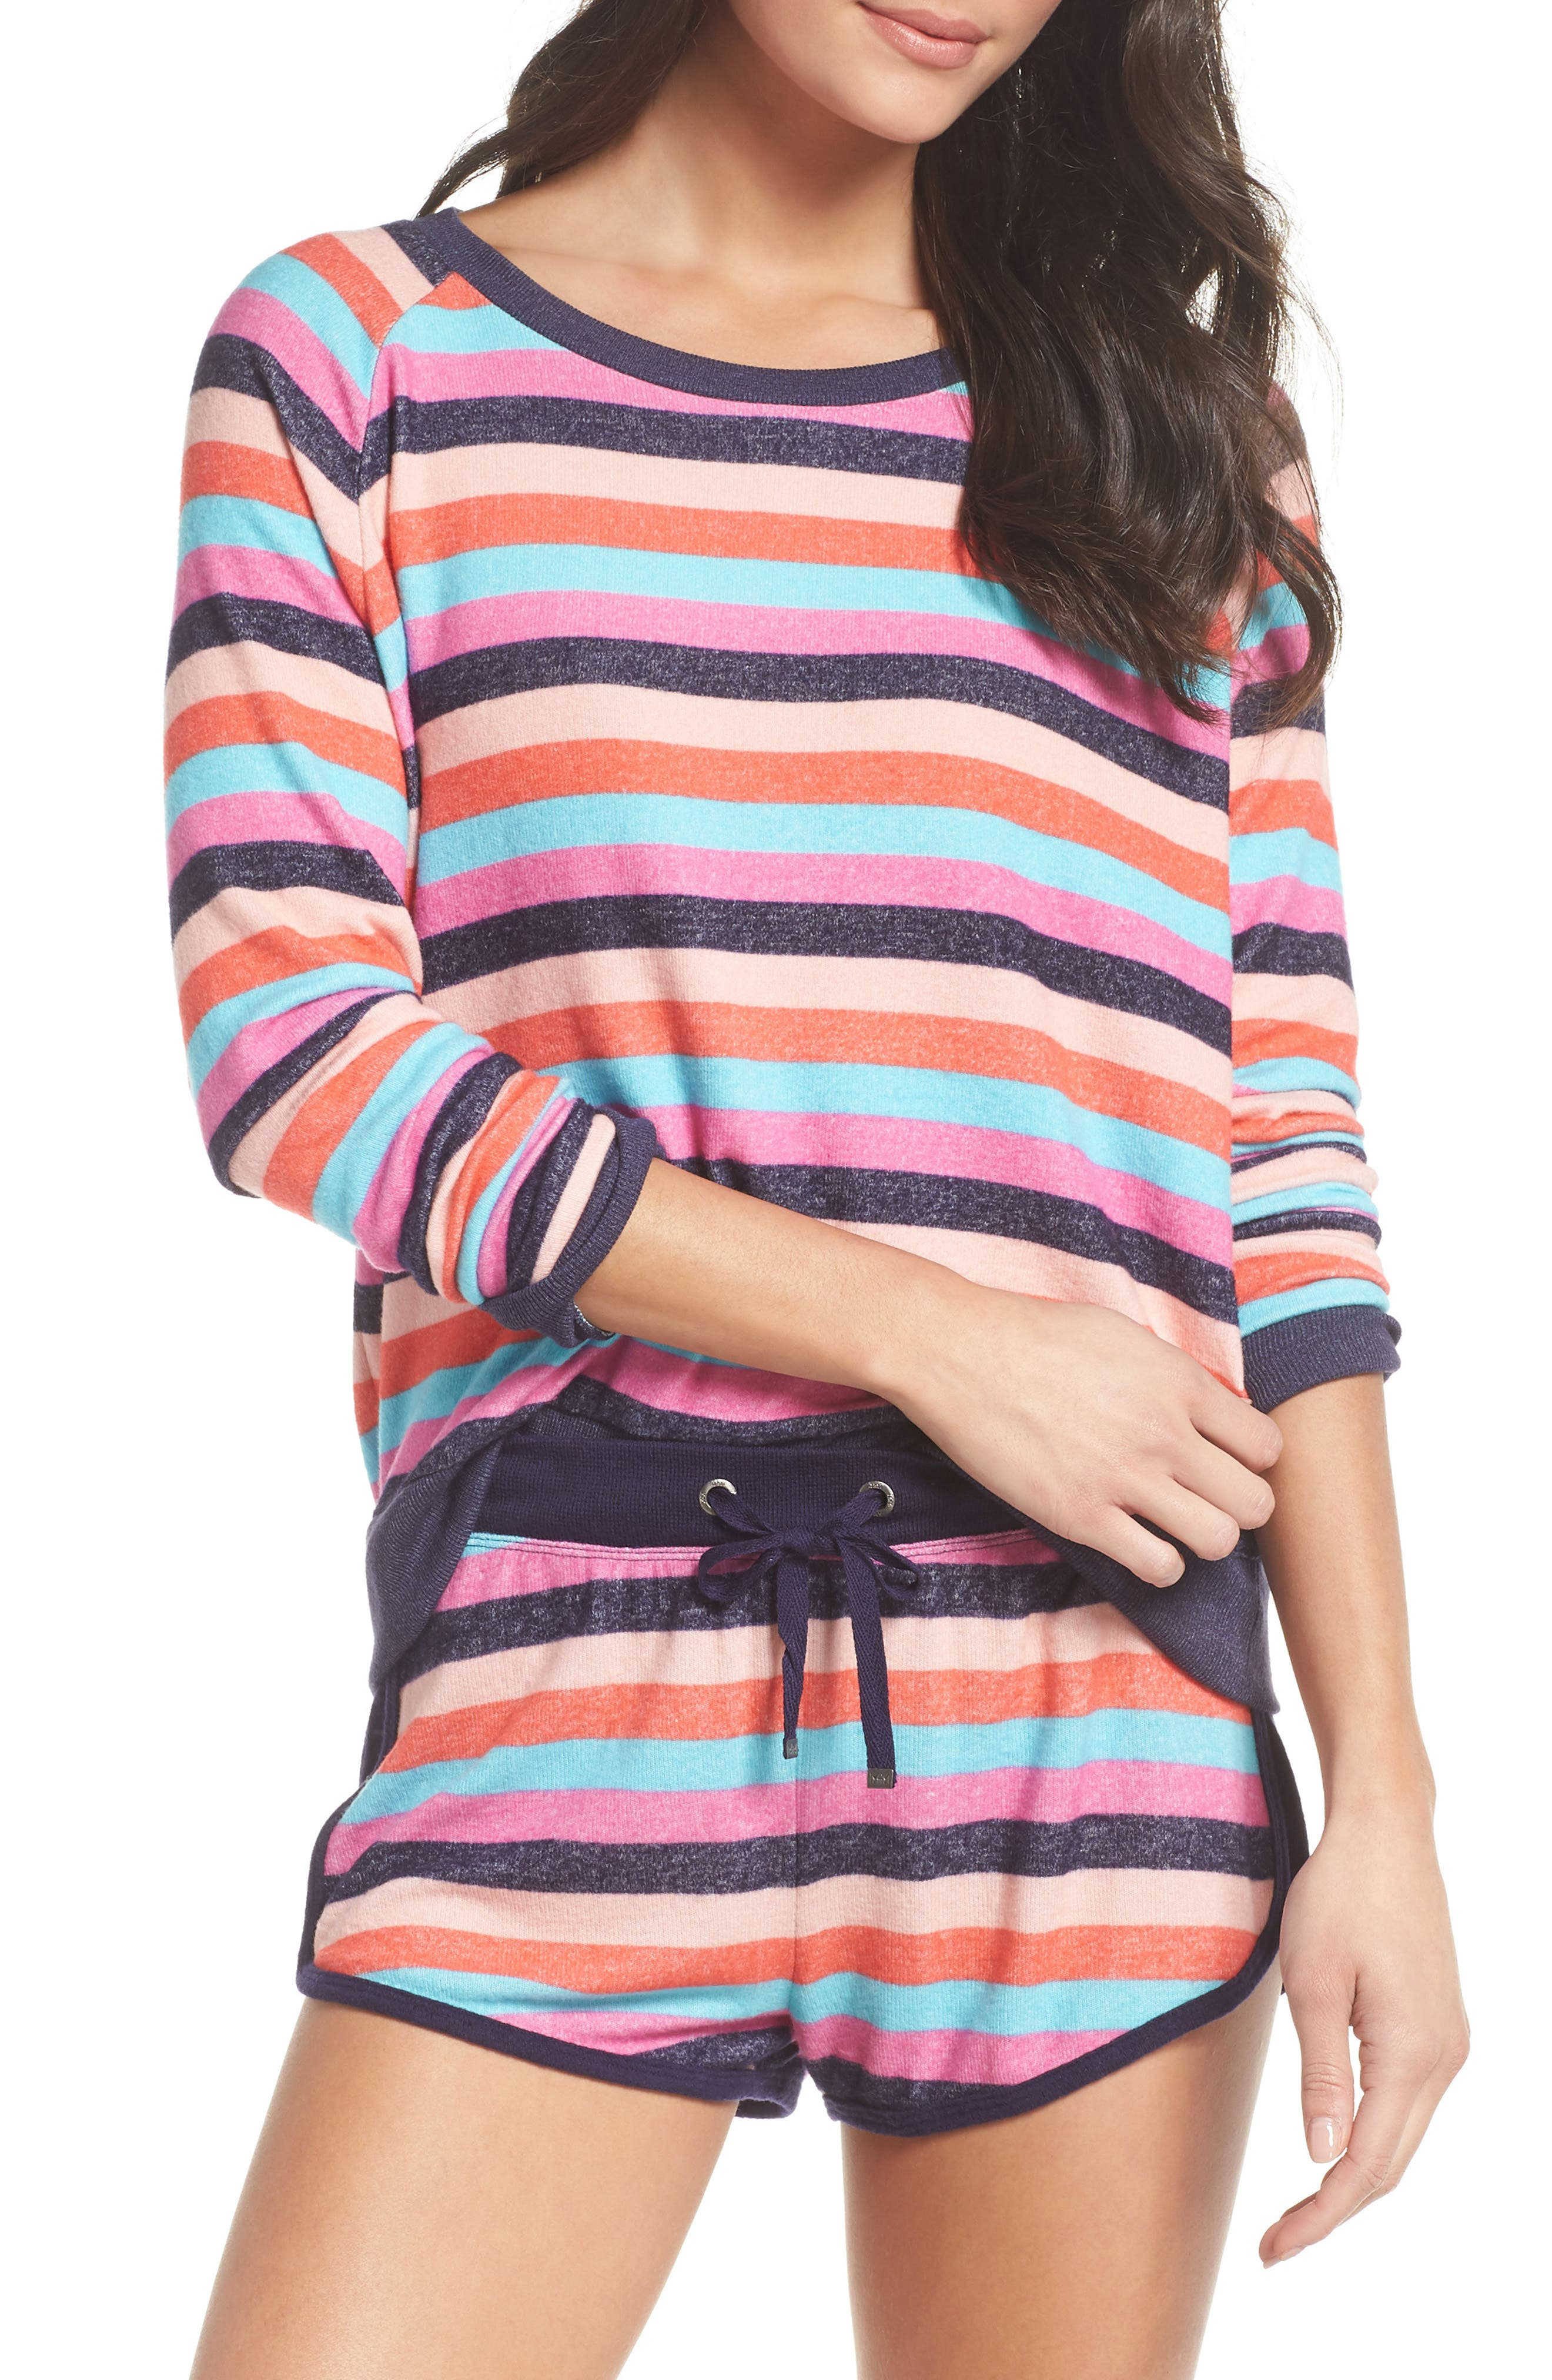 Cozy Crew Raglan Sweatshirt,                             Main thumbnail 1, color,                             Navy Dusk Milli Multi Stripe